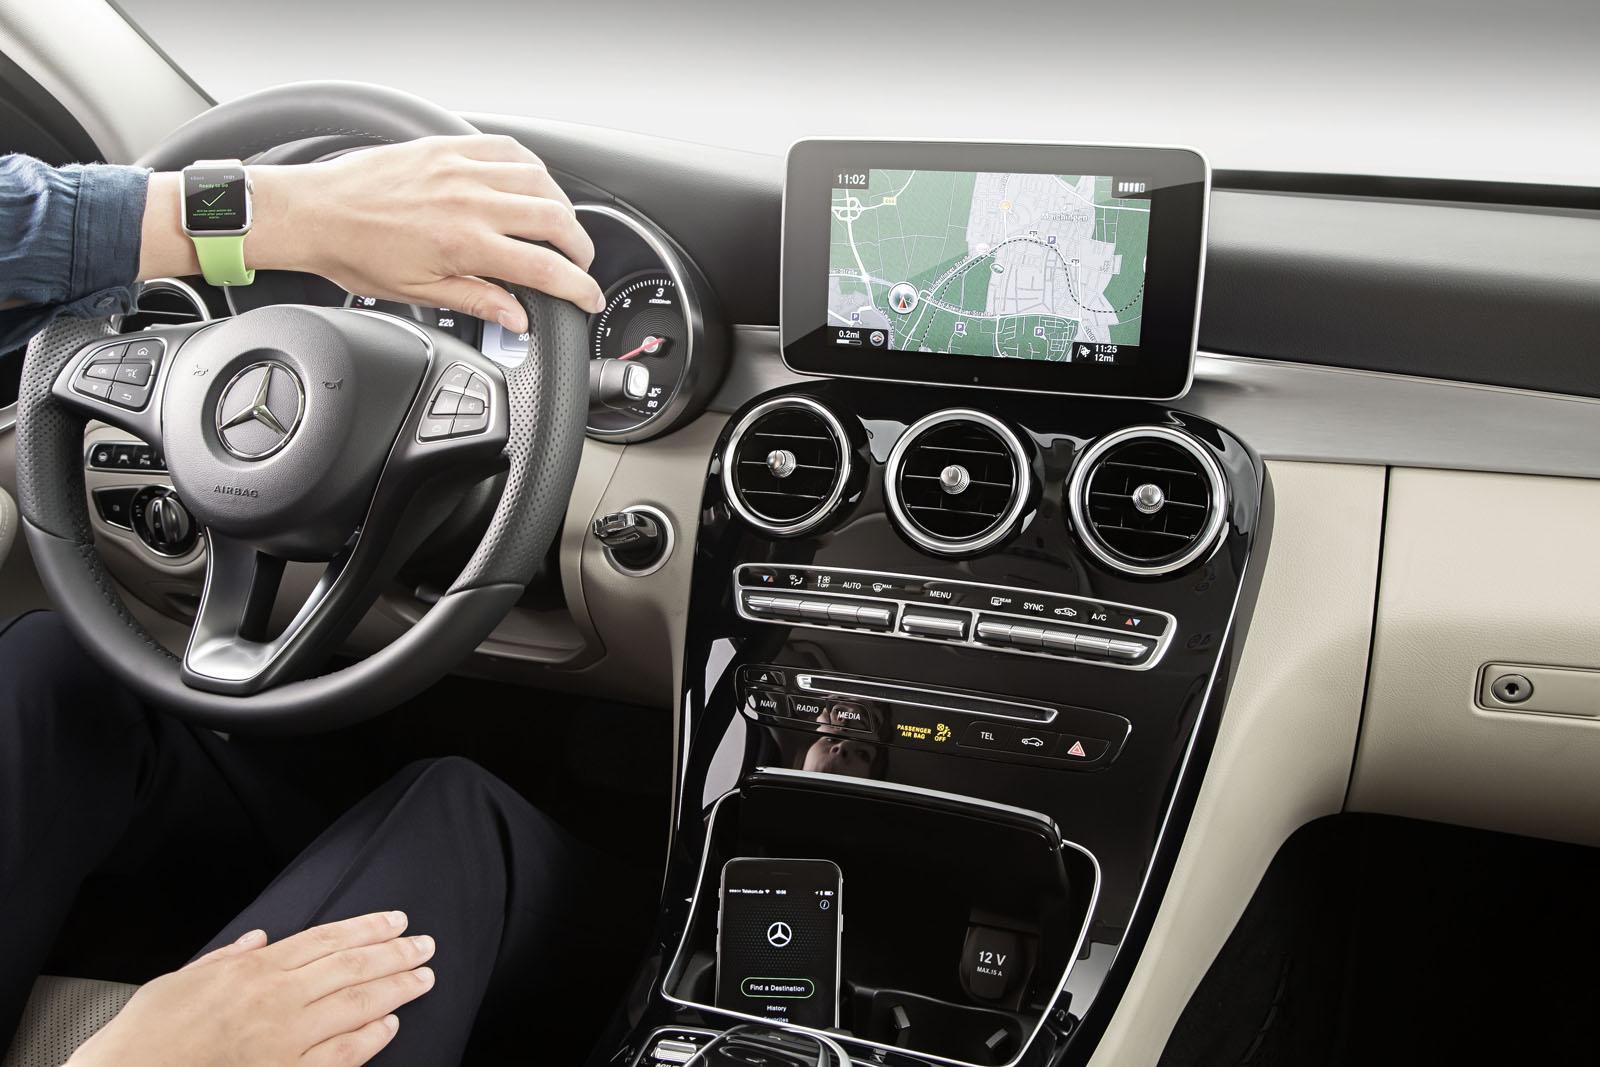 Mercedes app Apple Watch